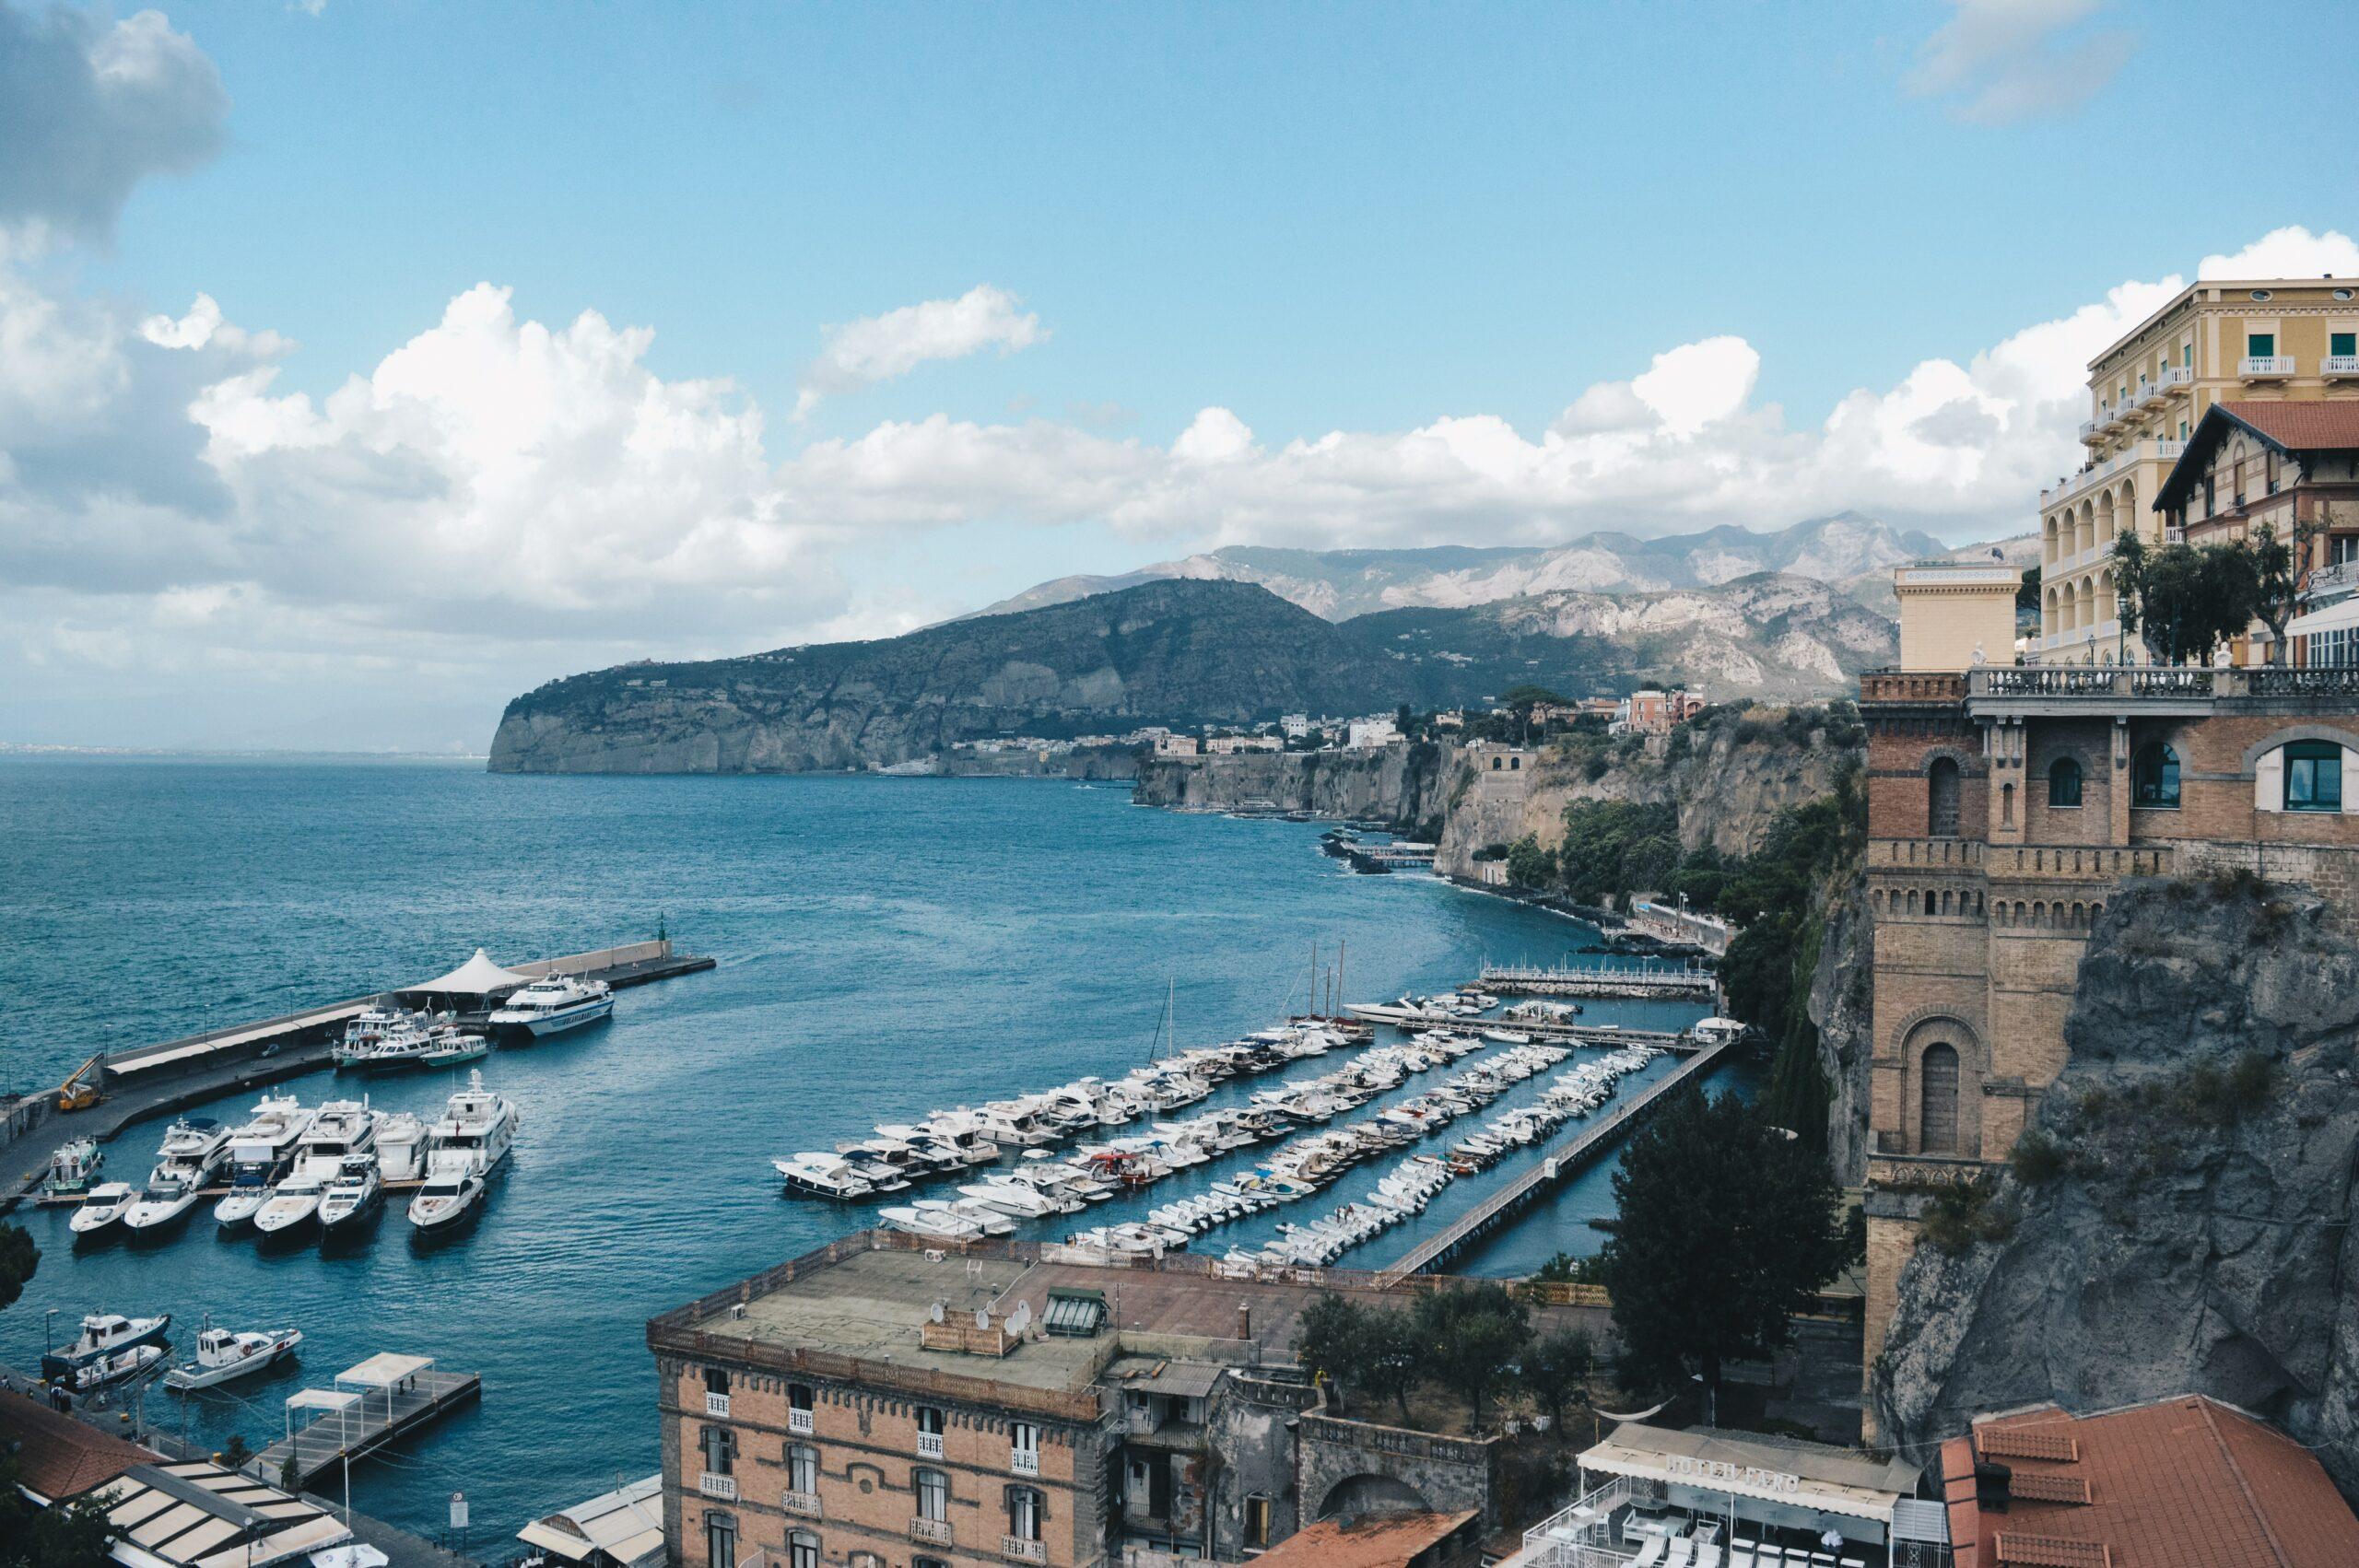 Val DiGiorgio study abroad scholarship